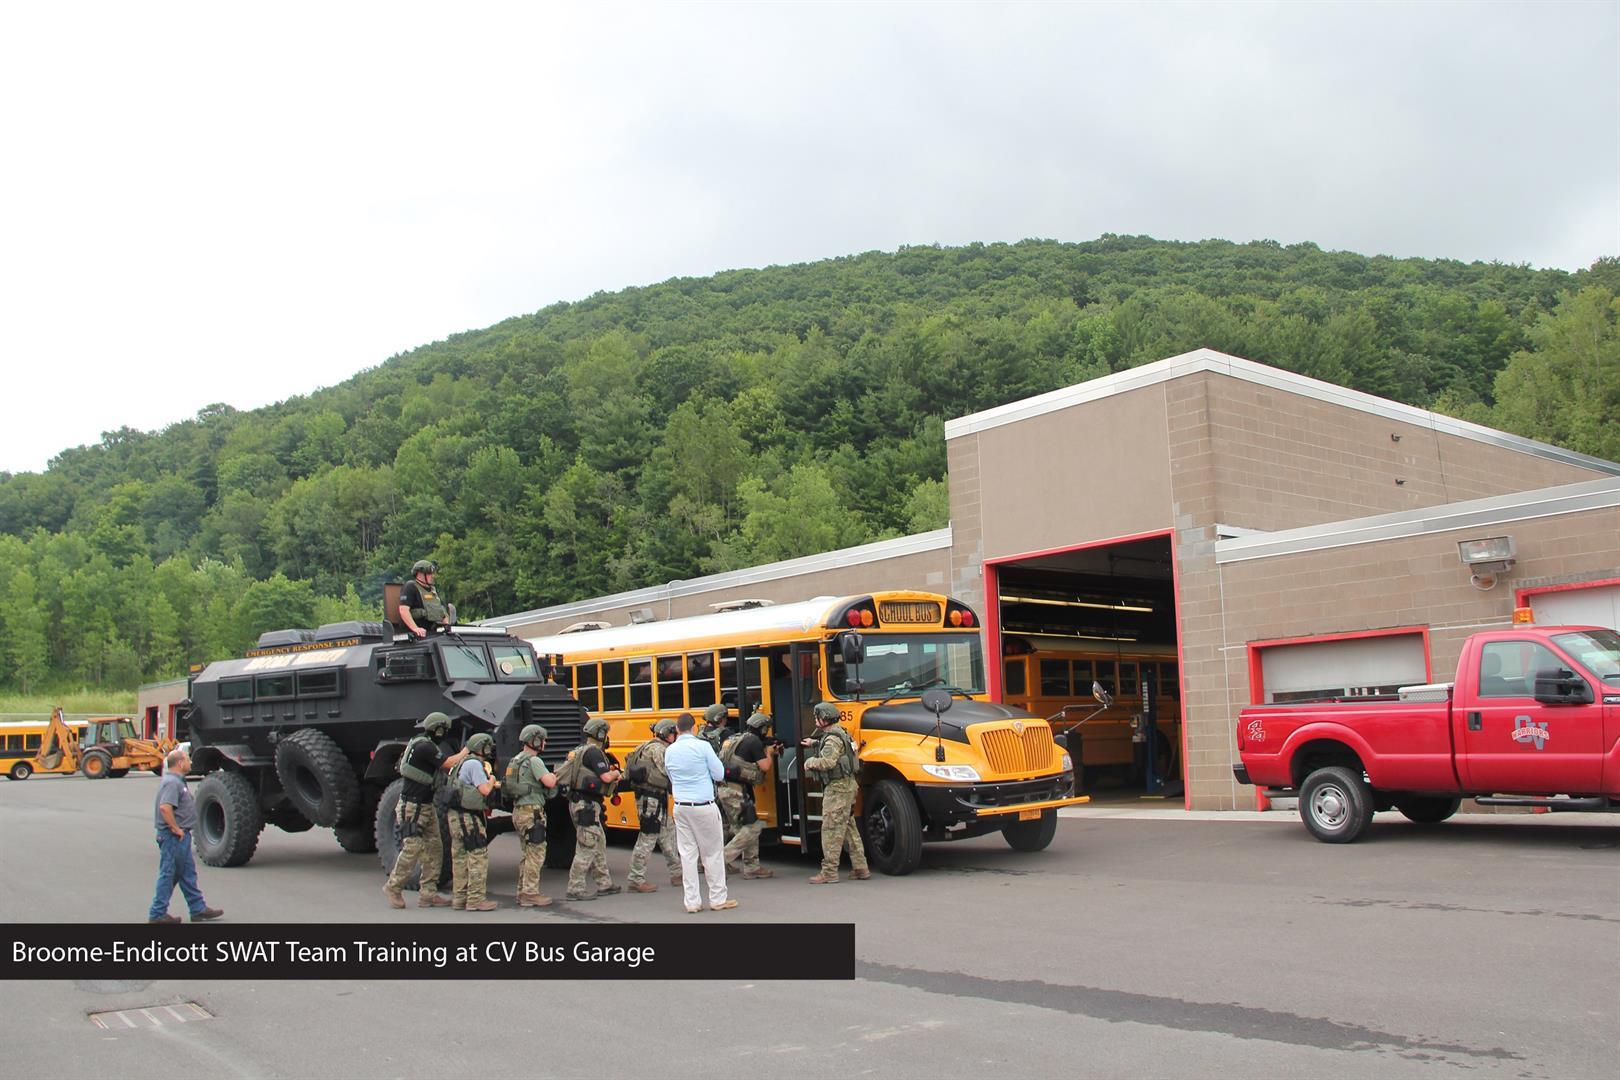 far shot of members of broome endicott swat team training at c v bus garage